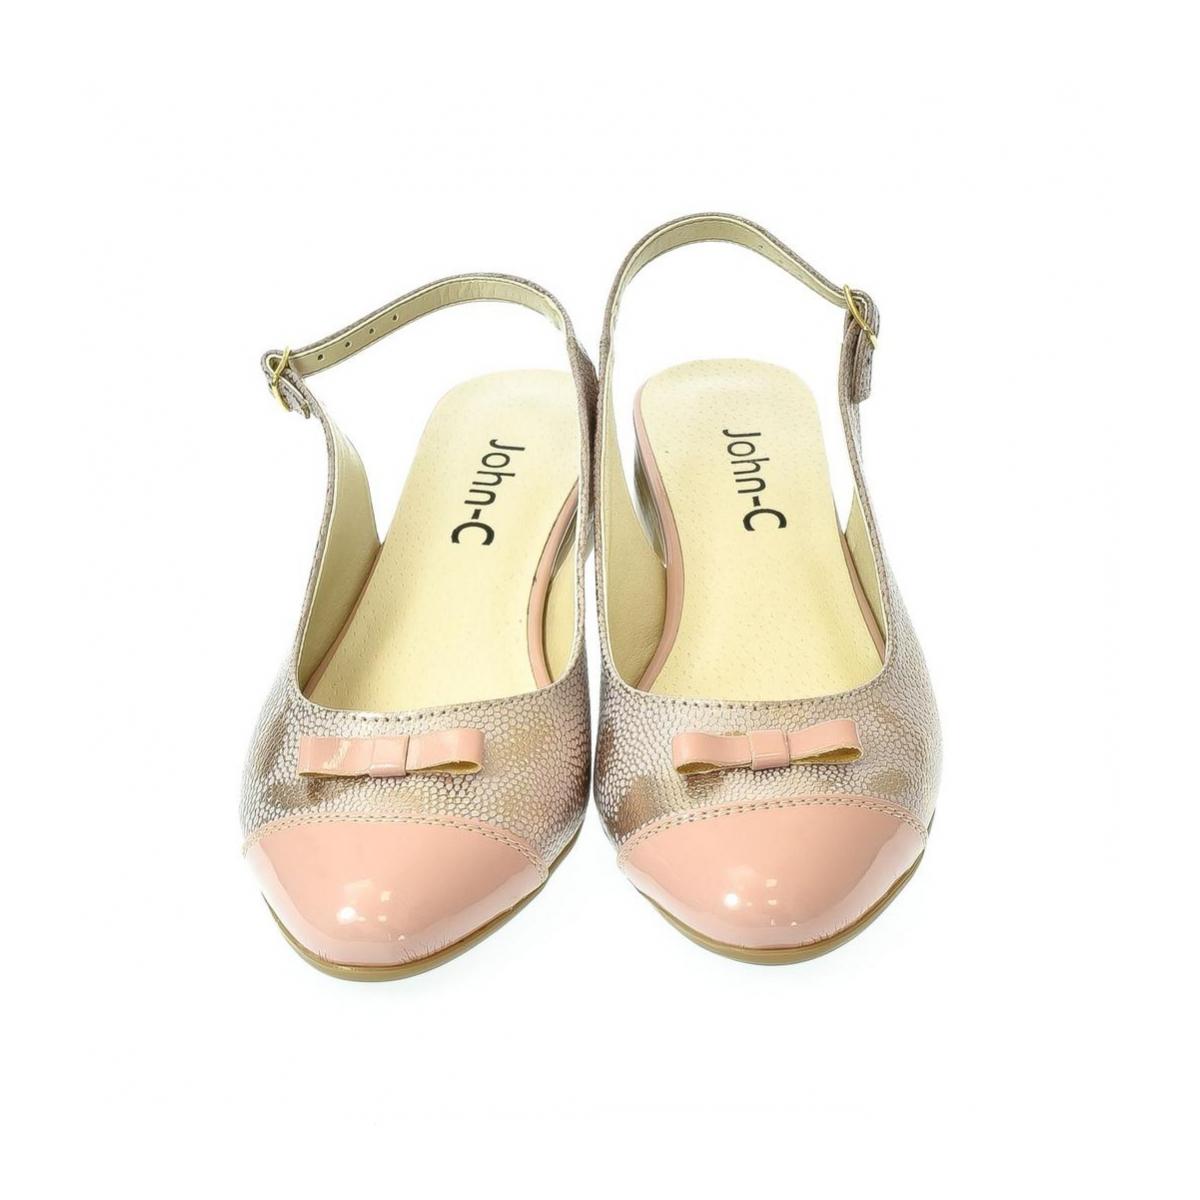 22f9ca3964c0 Dámske ružové sandále Eveline - 6